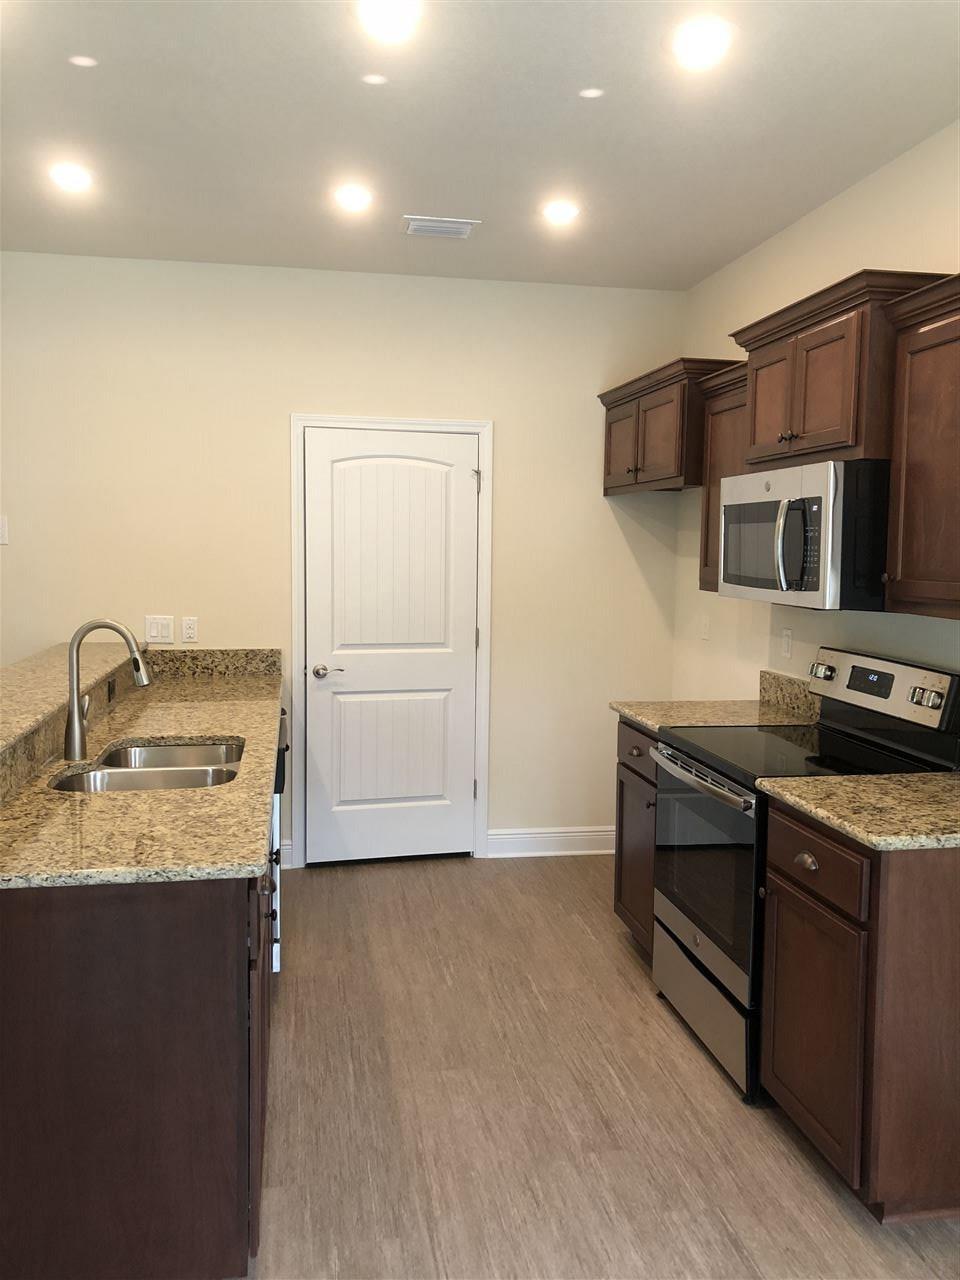 212 S J St, Pensacola, FL 32502